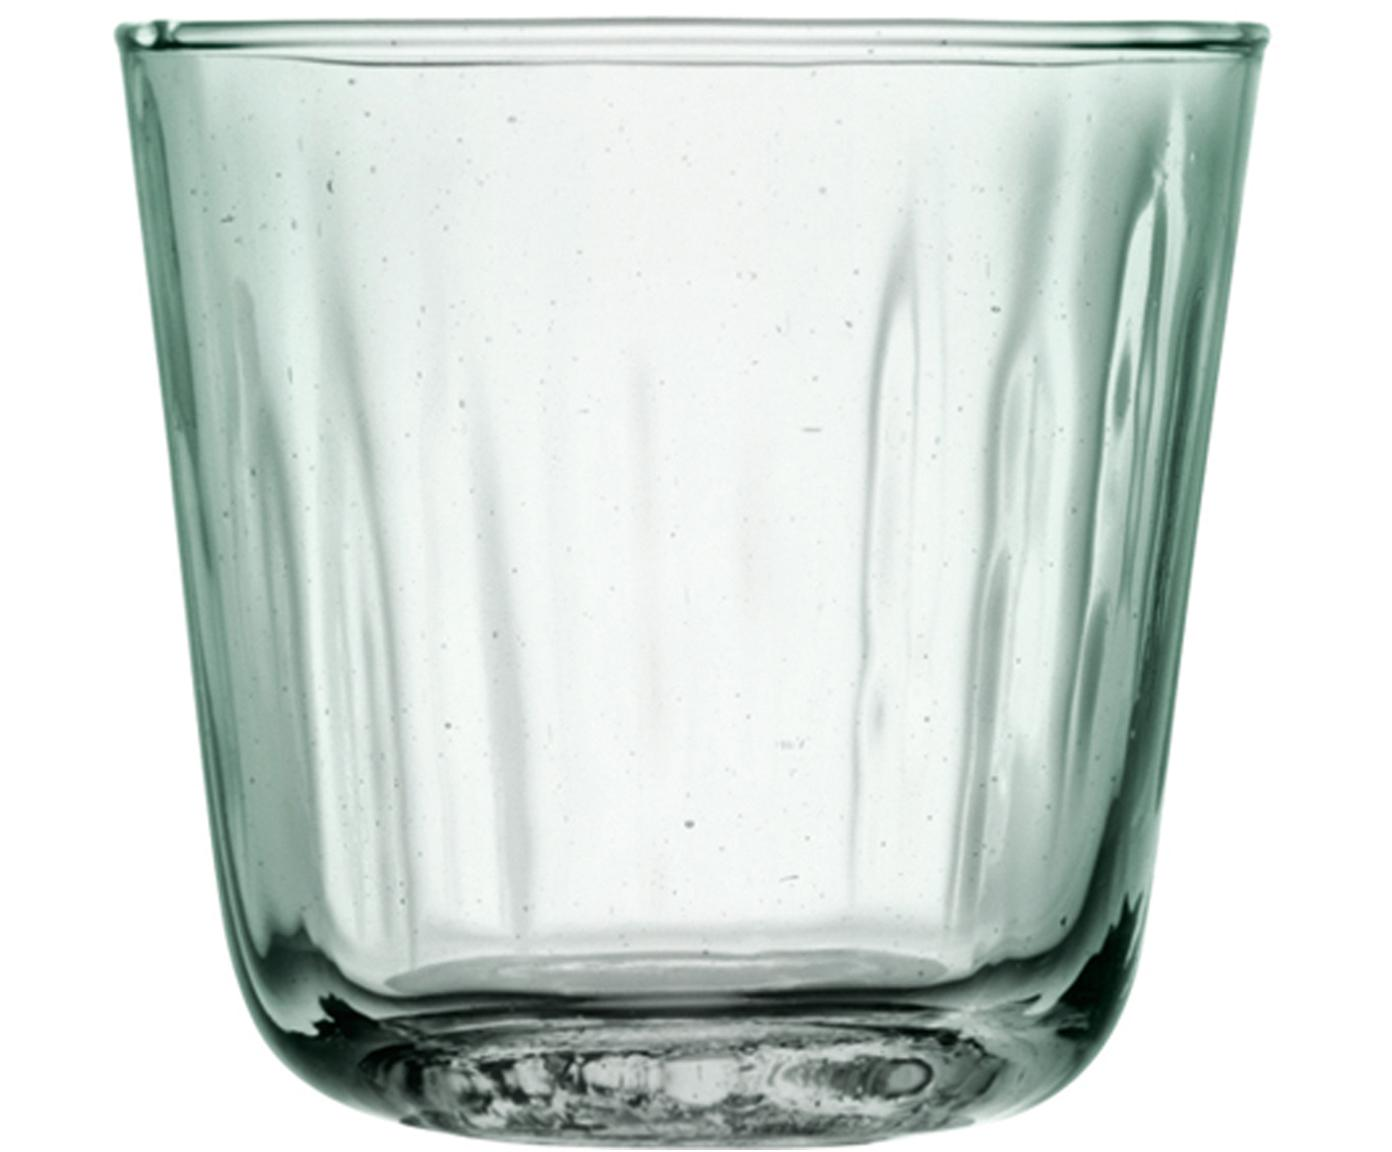 Waterglazen Mia, 4 stuks, Gerecycled glas, Turquoise, transparant, Ø 9 x H 8 cm